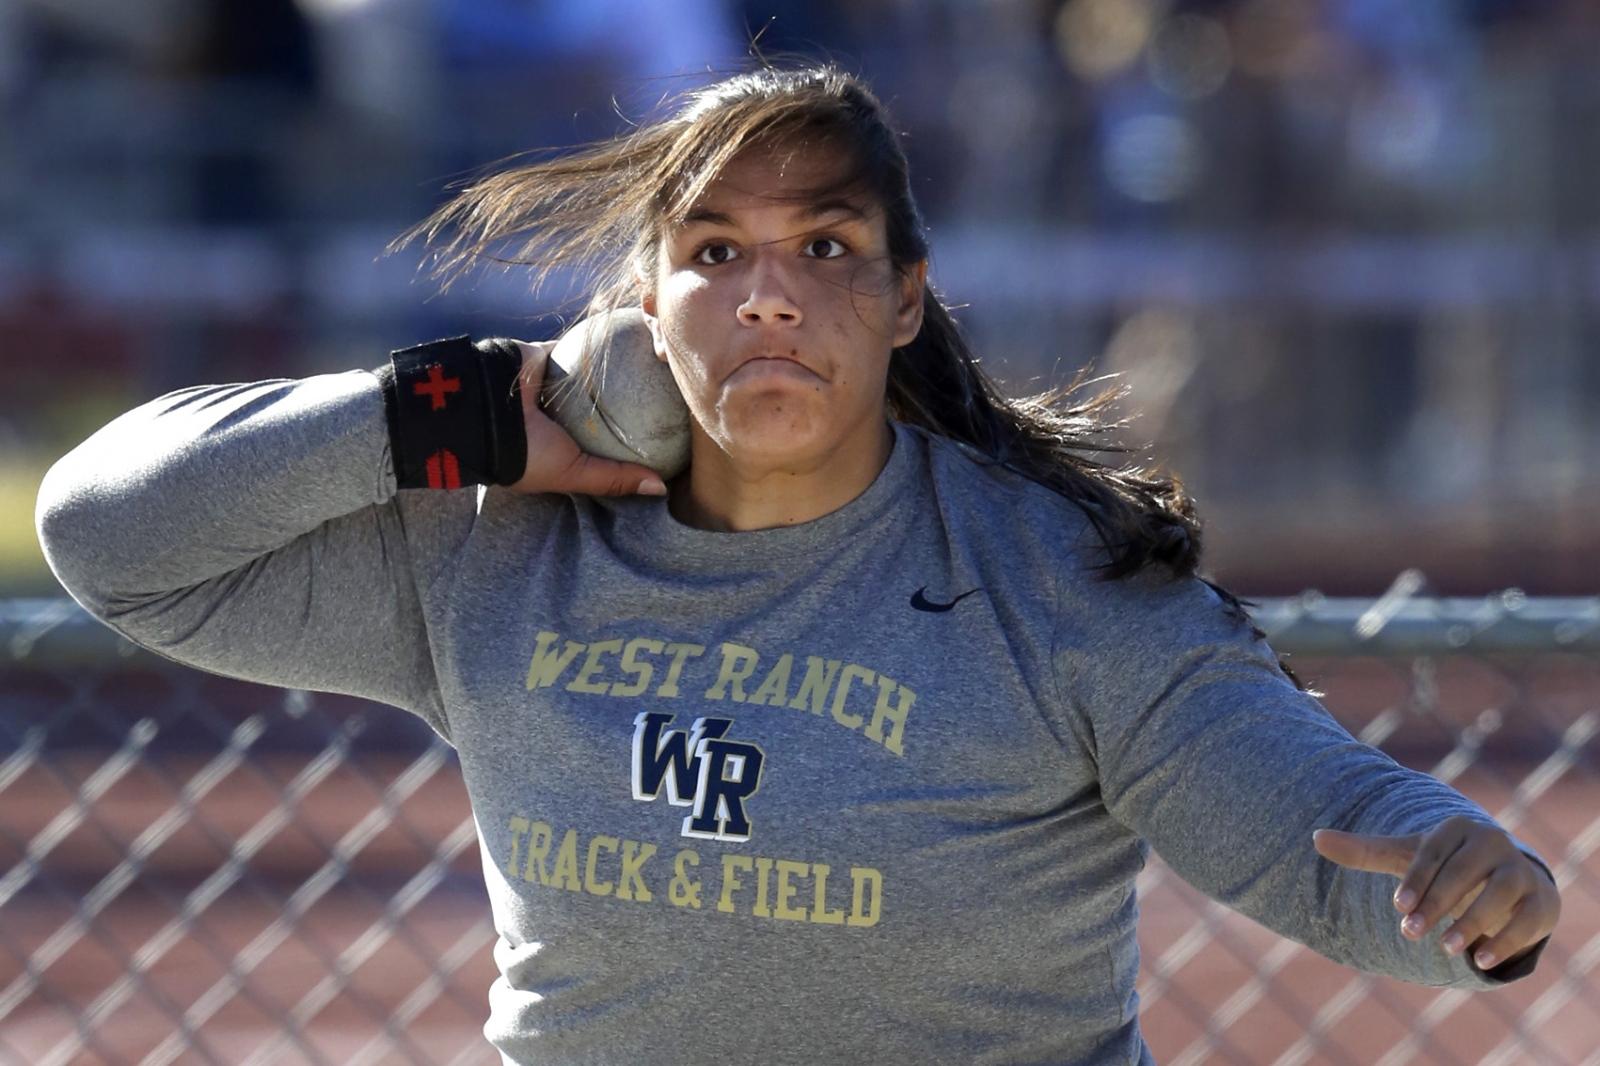 West Ranch's Natalie Ramirez throws the shot put during a dual meet at Saugus on Thursday, April 20, 2017.